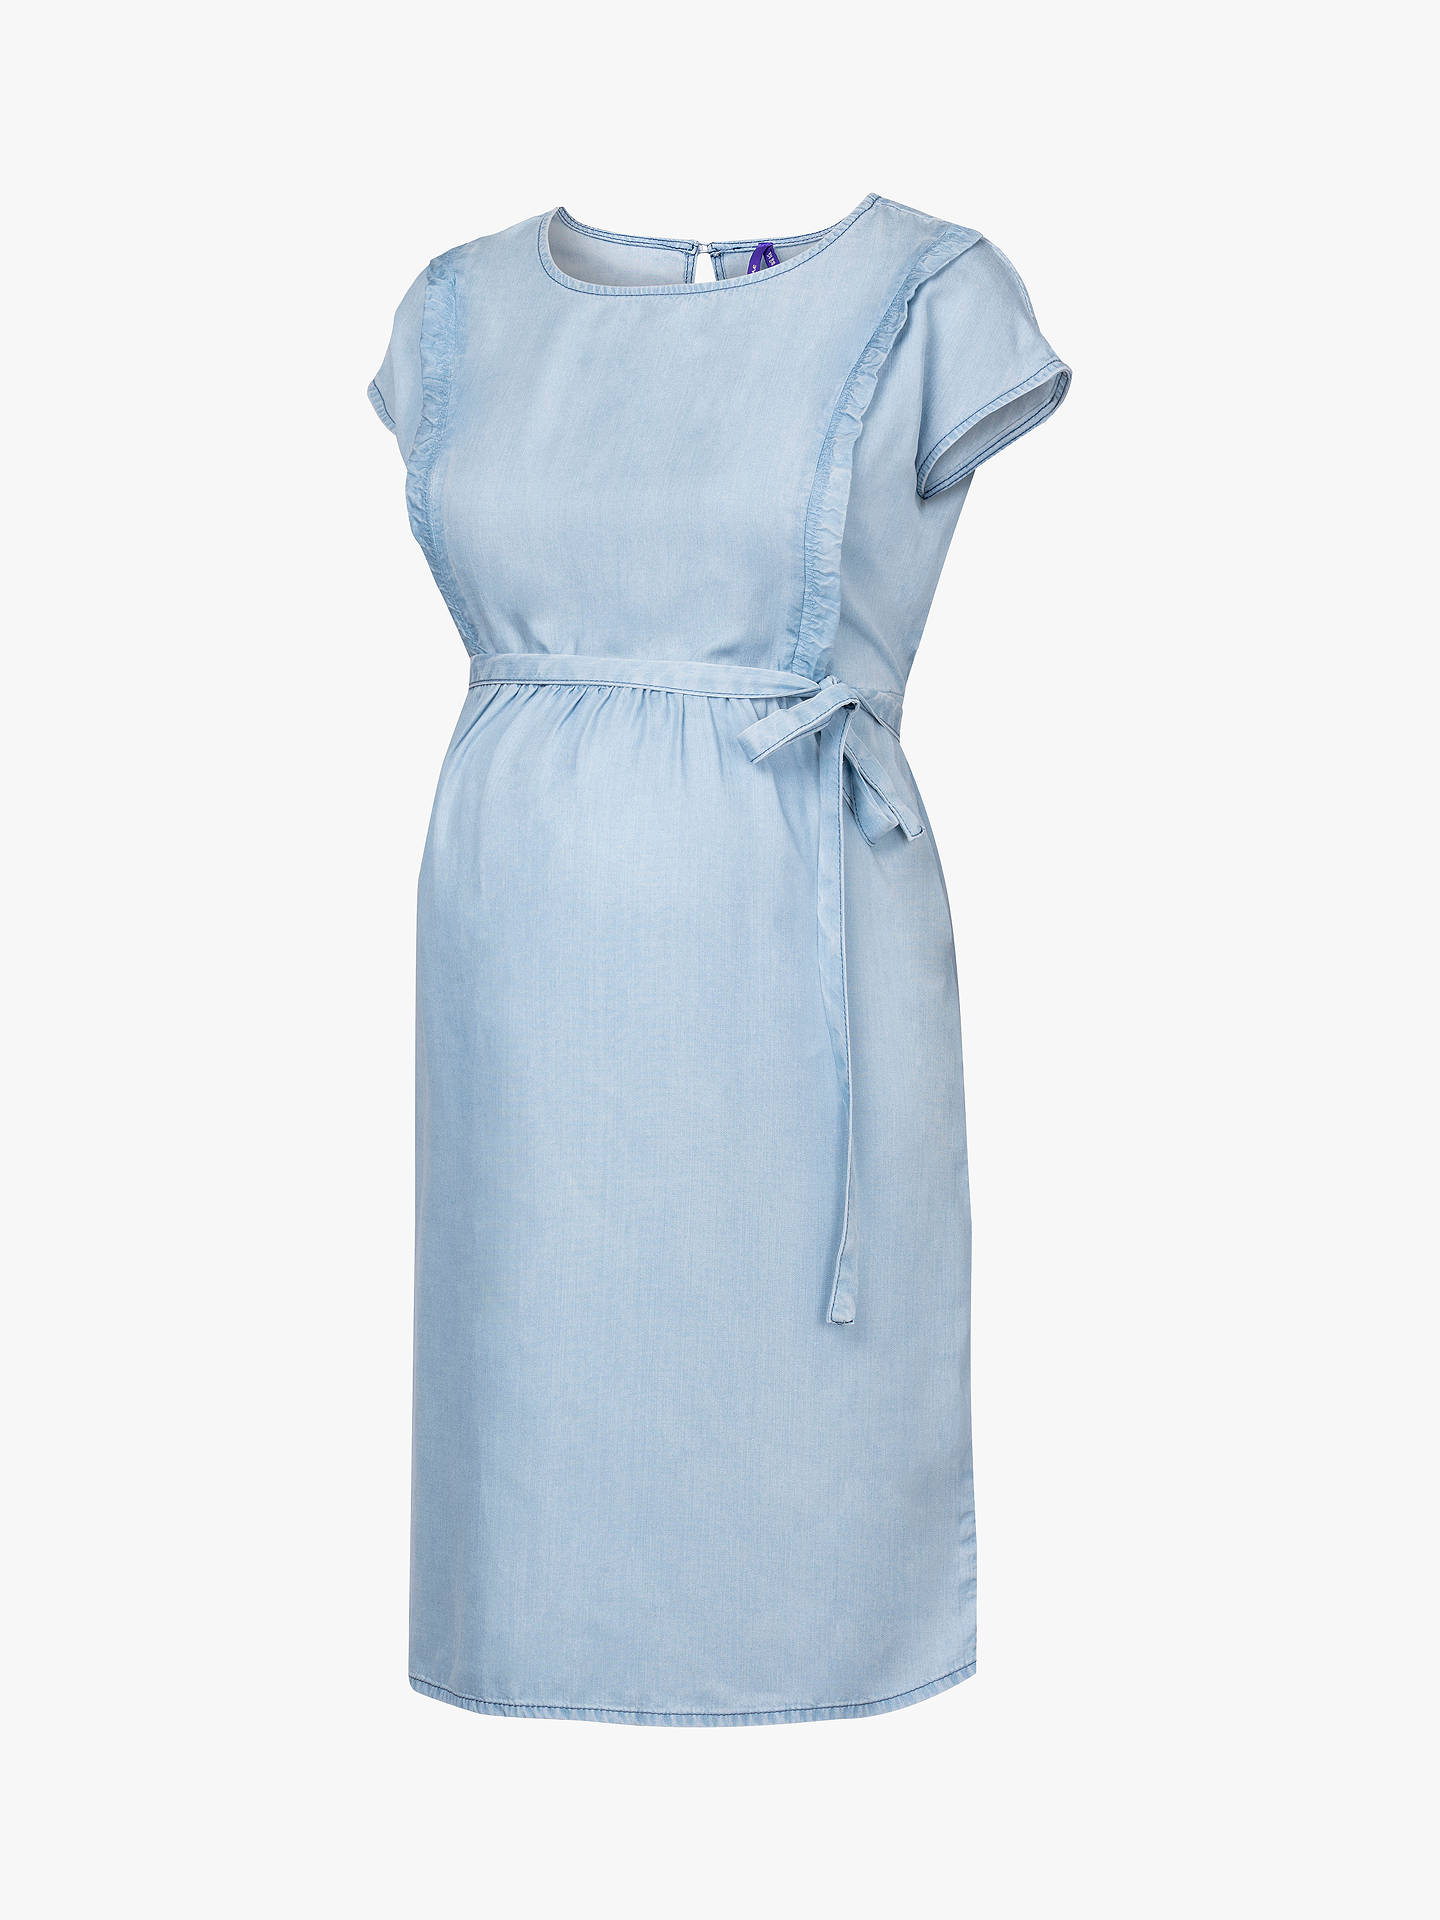 d680f0c1a57 Buy Séraphine Alaska Tencel Maternity Nursing Dress